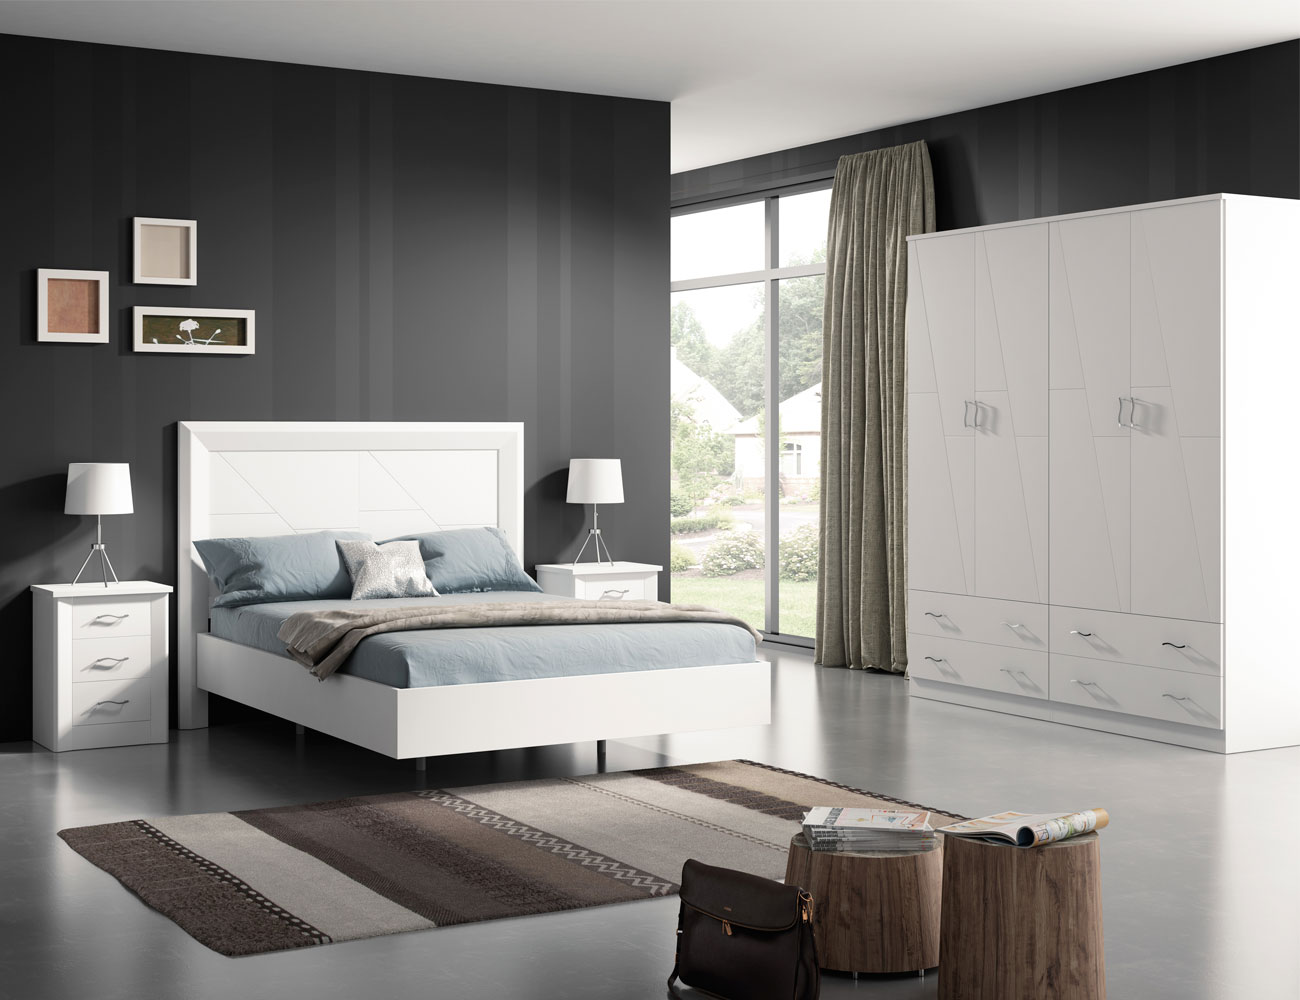 dormitorio de matrimonio en madera con cabecero tapizado